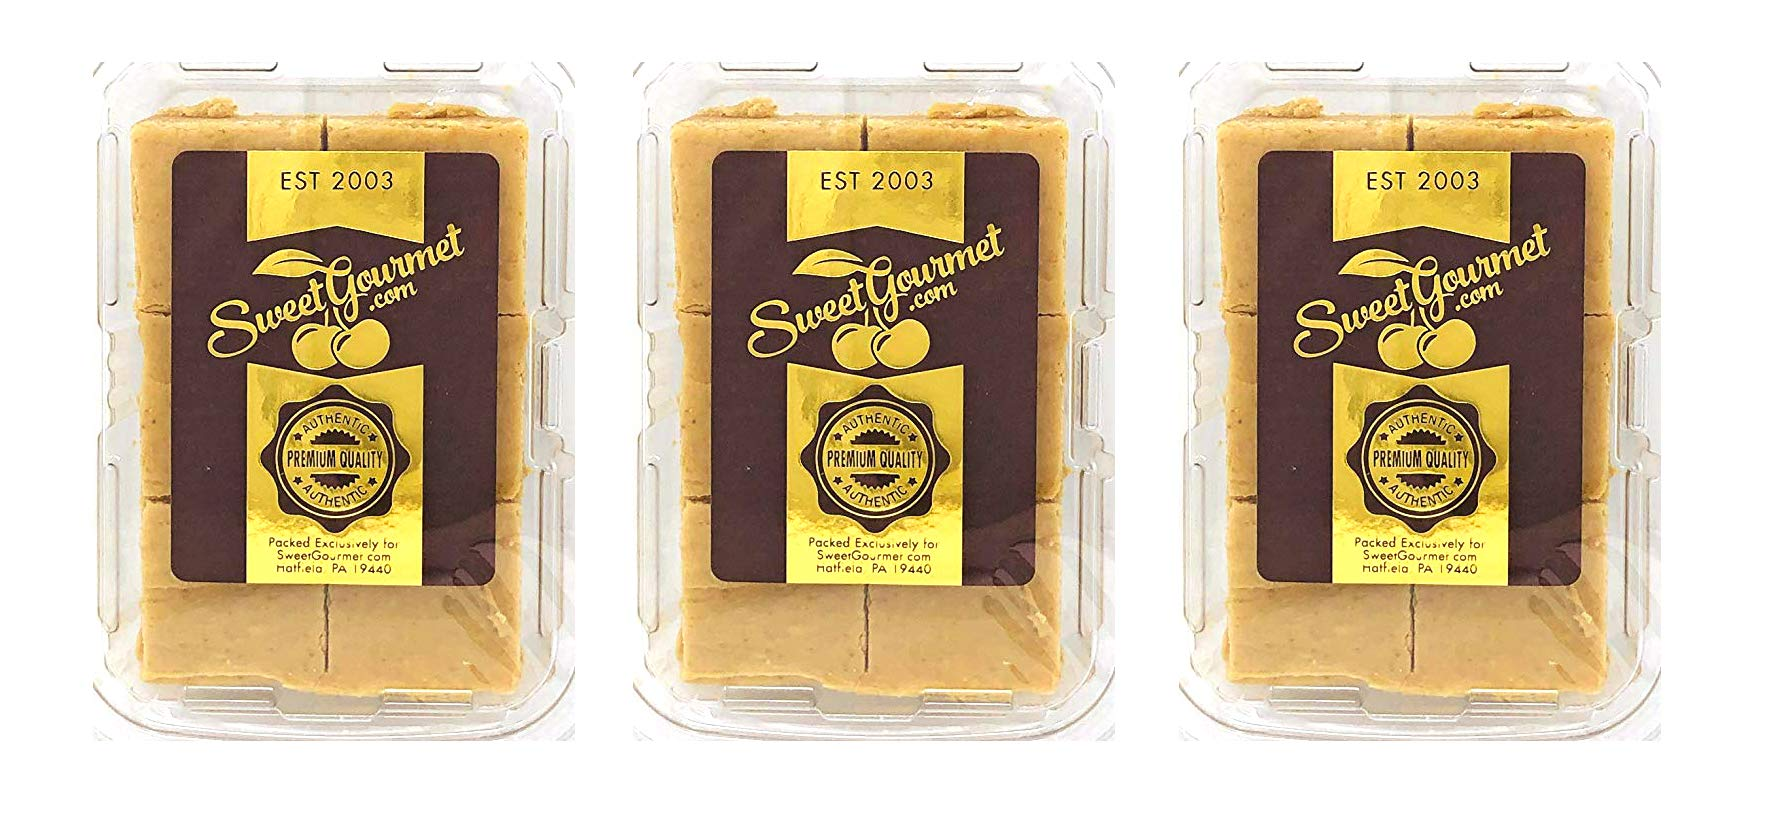 SweetGourmet Premium No Sugar Peanut Butter Fudge | Diabetic Safe, Sucralose | Low Net Carbs | Pack of 3 Boxes | 36oz by SweetGourmet